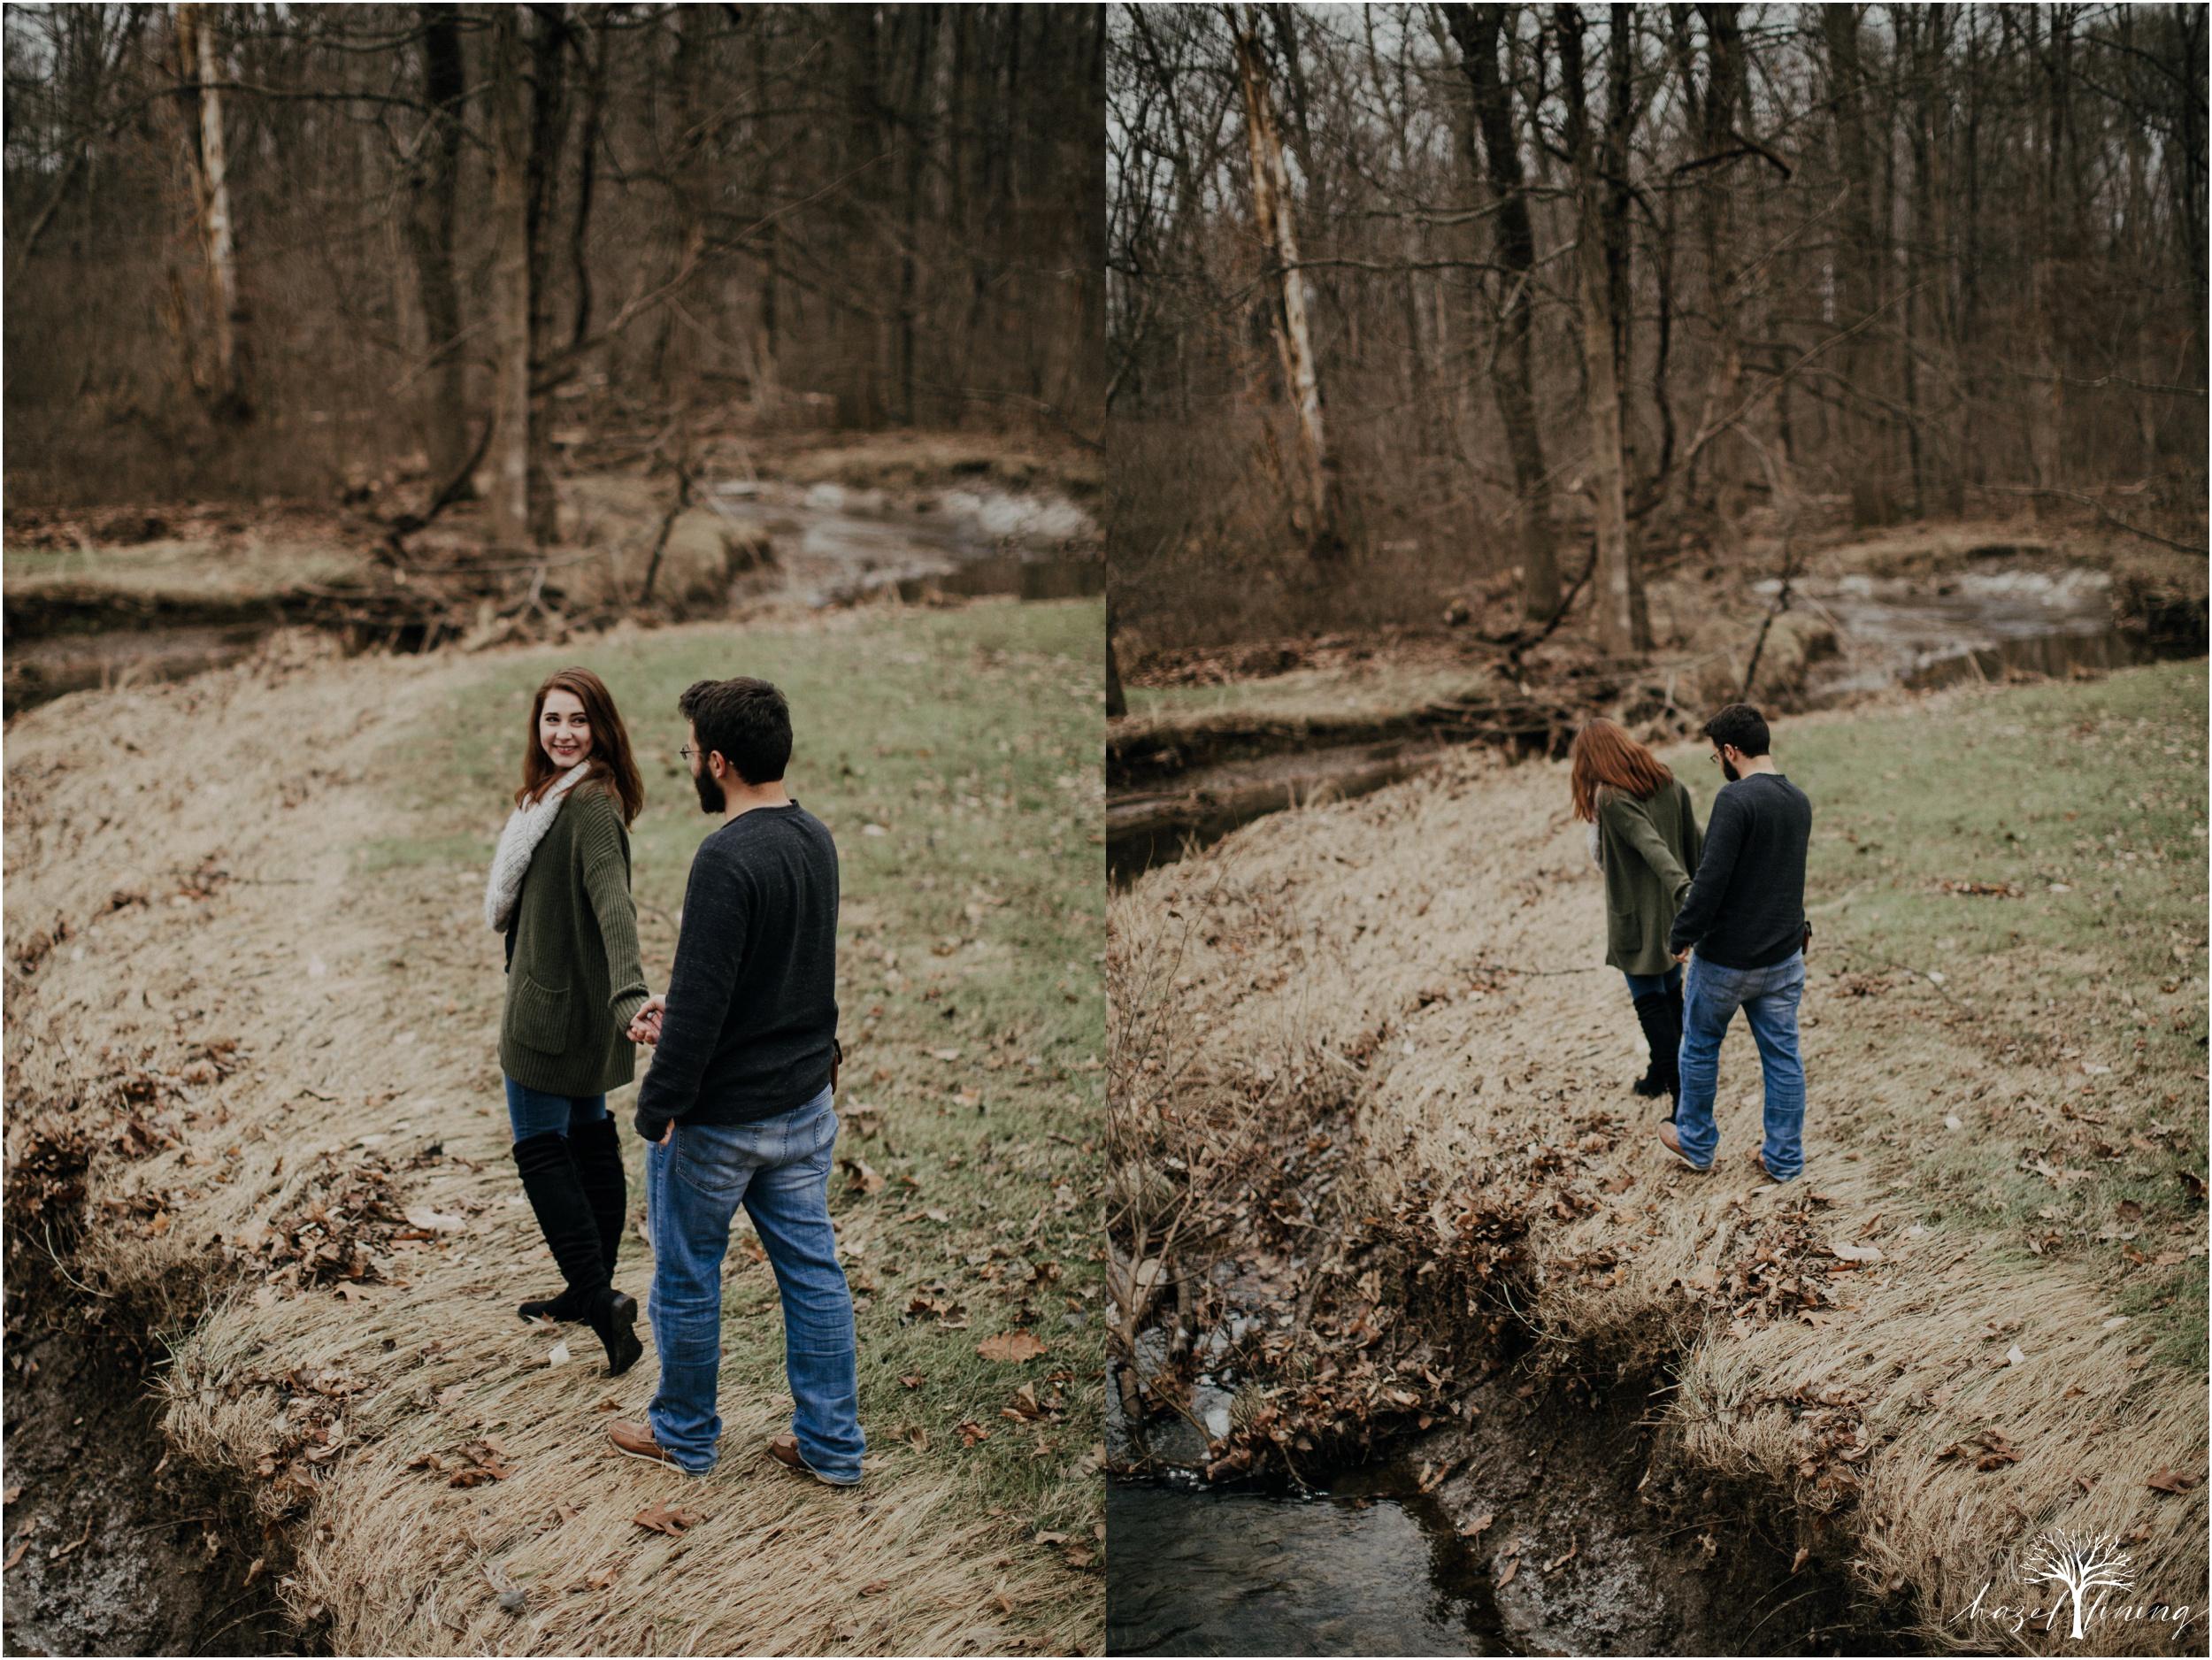 evan-maggie-lesh-one-year-anniversary-winter-shoot-camp-menolan-pennsylvania_0031.jpg